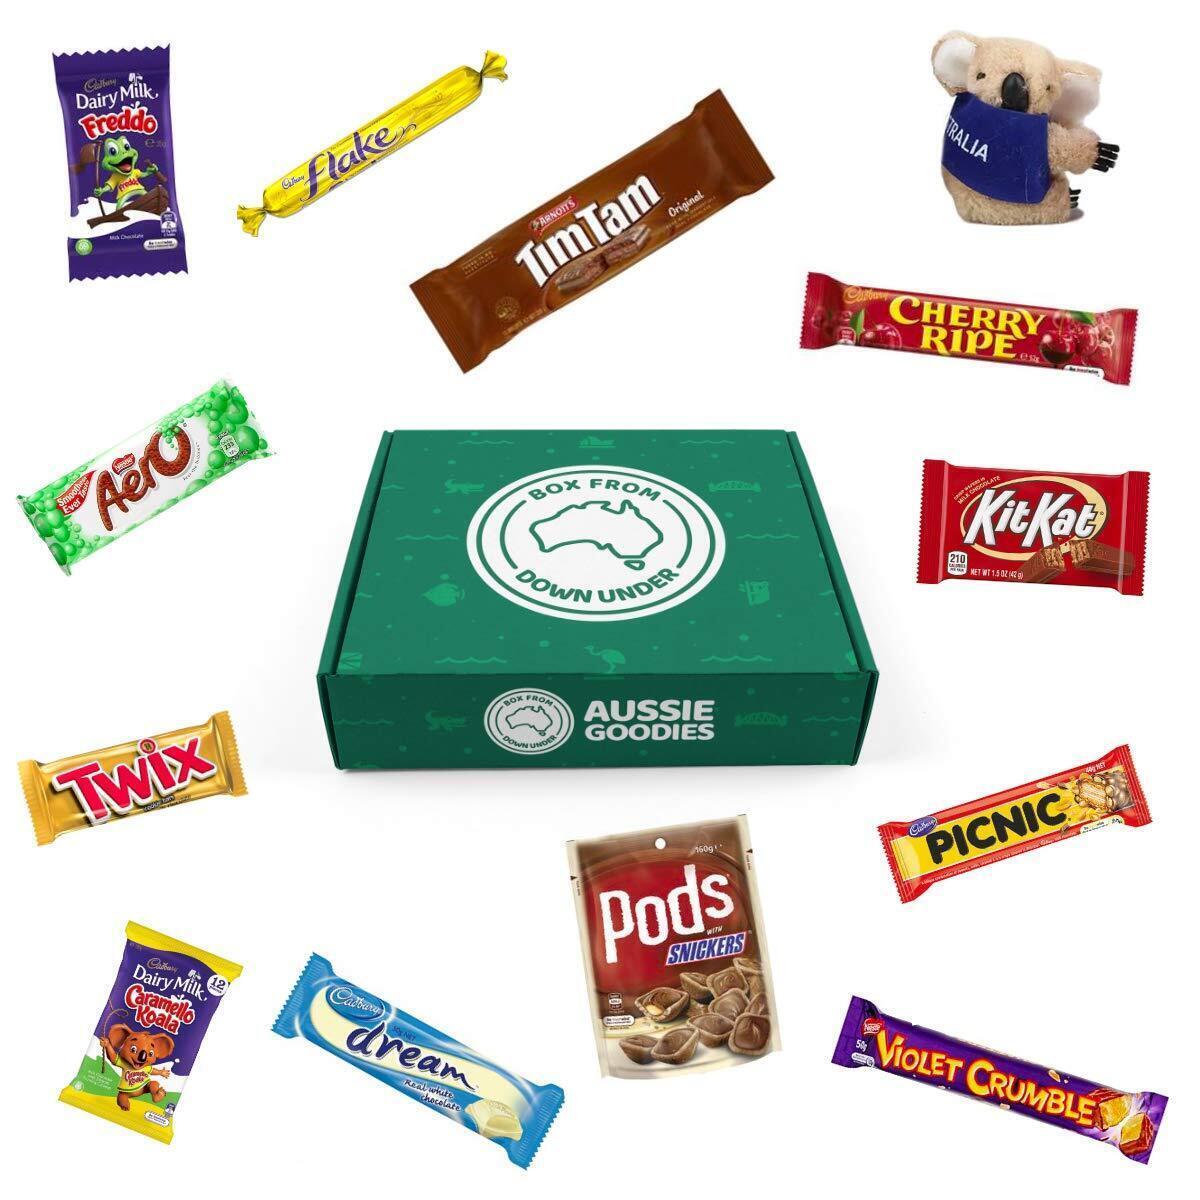 Box from Down Under Australian Chocolate Snack Gift Box